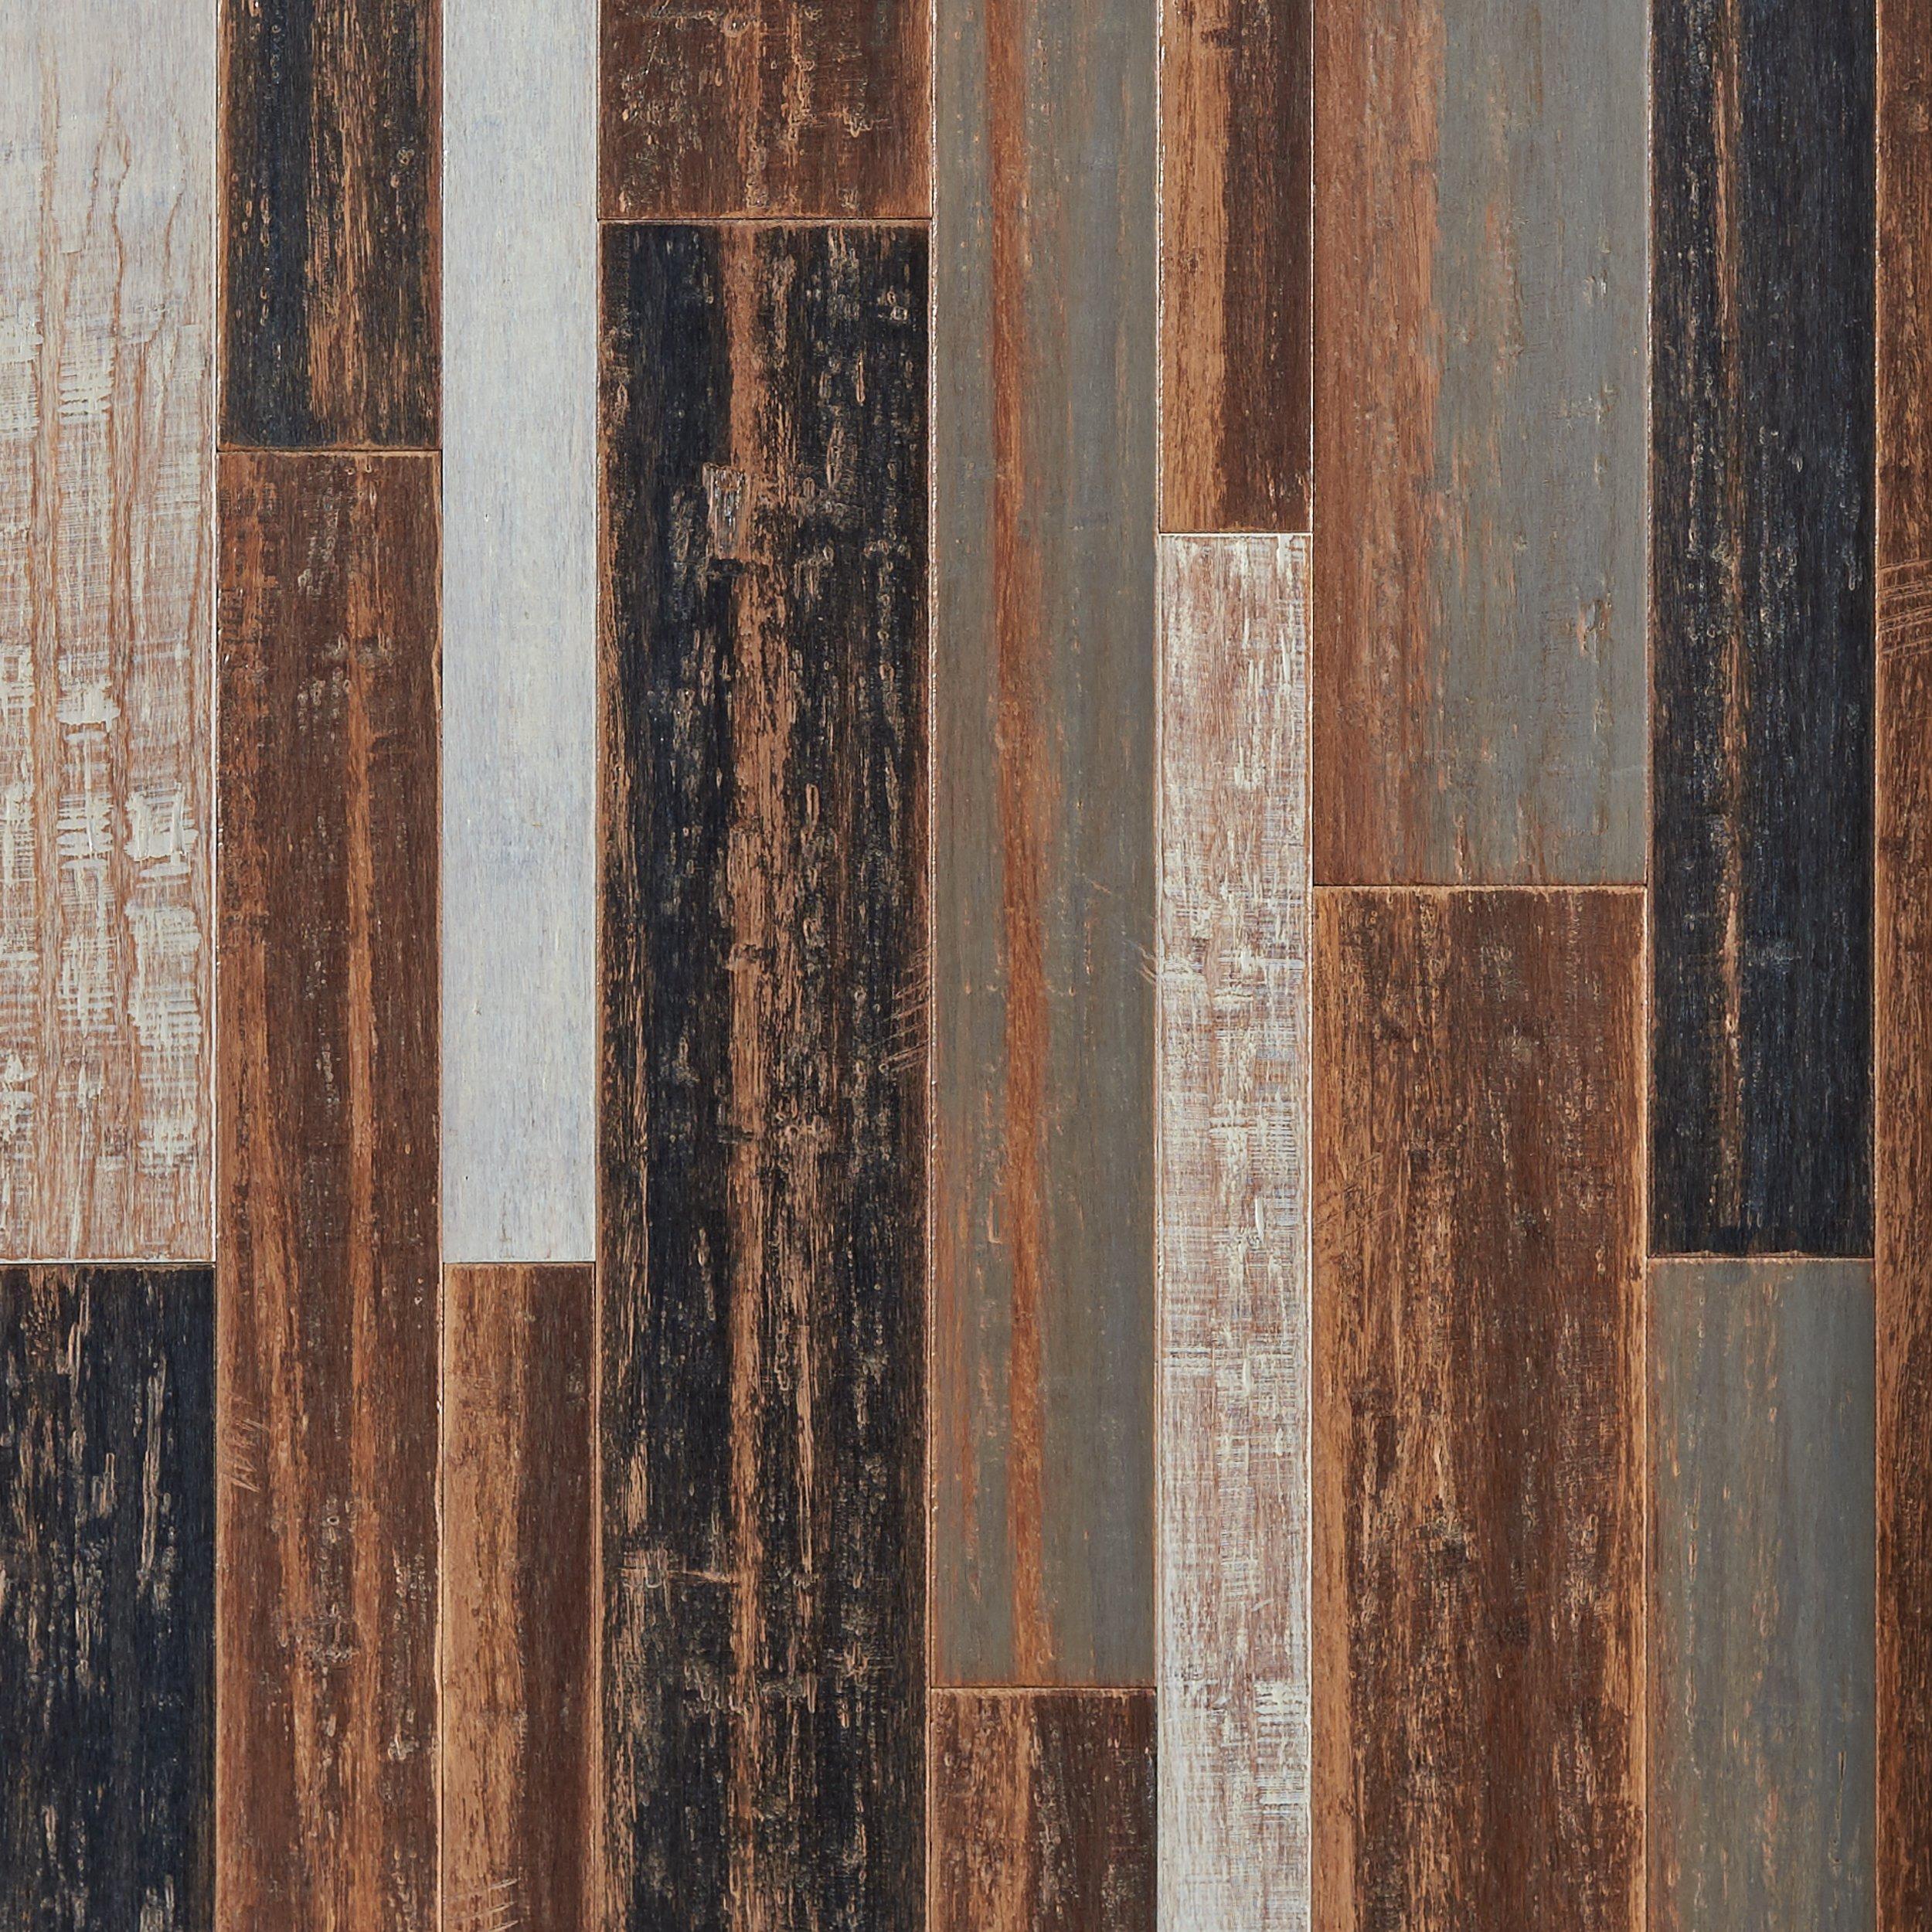 ceramic tile kitchen hotel suites with in atlanta ga ecoforest dolpino antique locking engineered bamboo - 1 ...